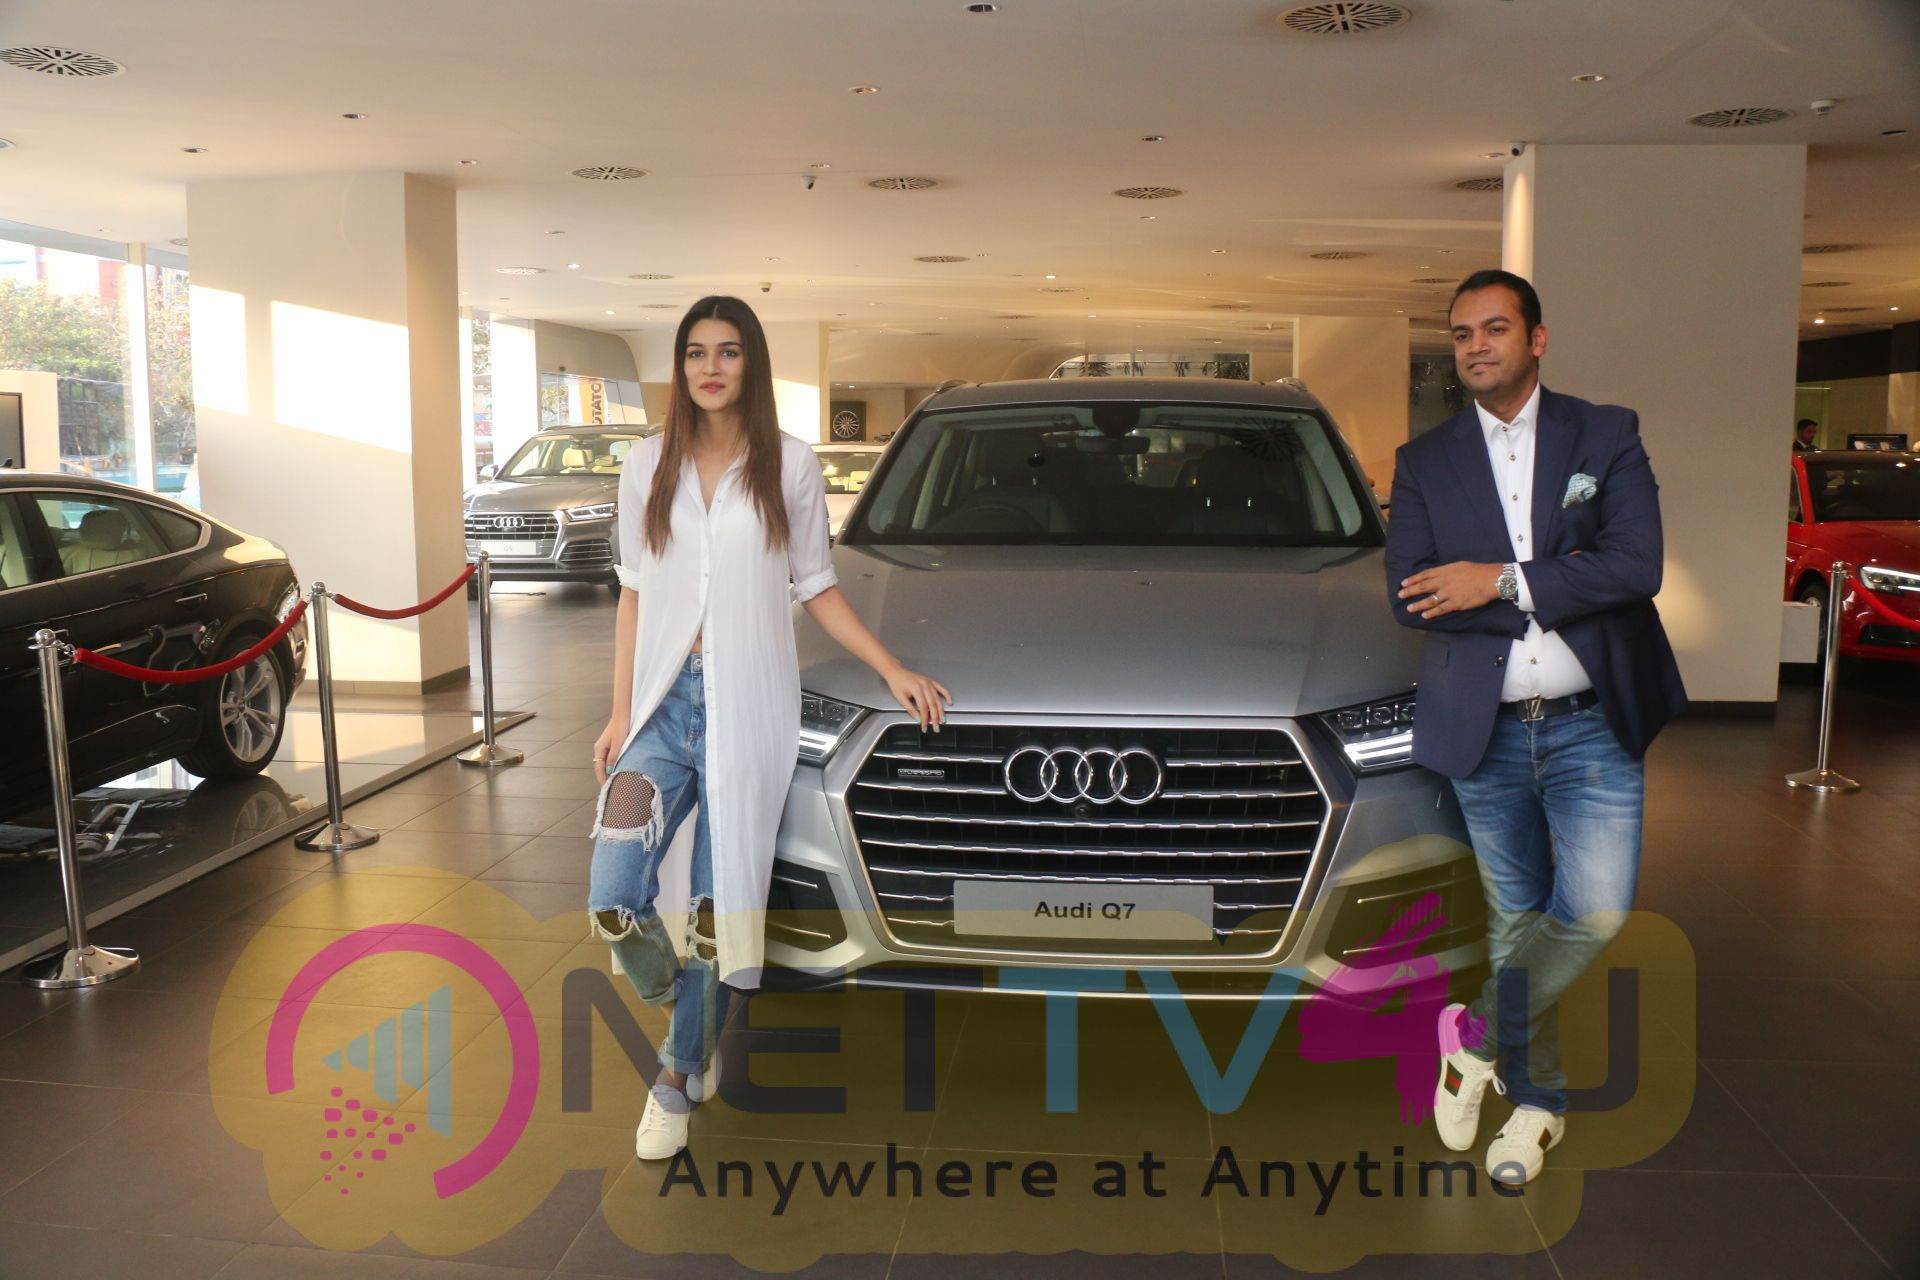 Kriti Sanon Taking The Delivery Of The Audi Q7 Stills